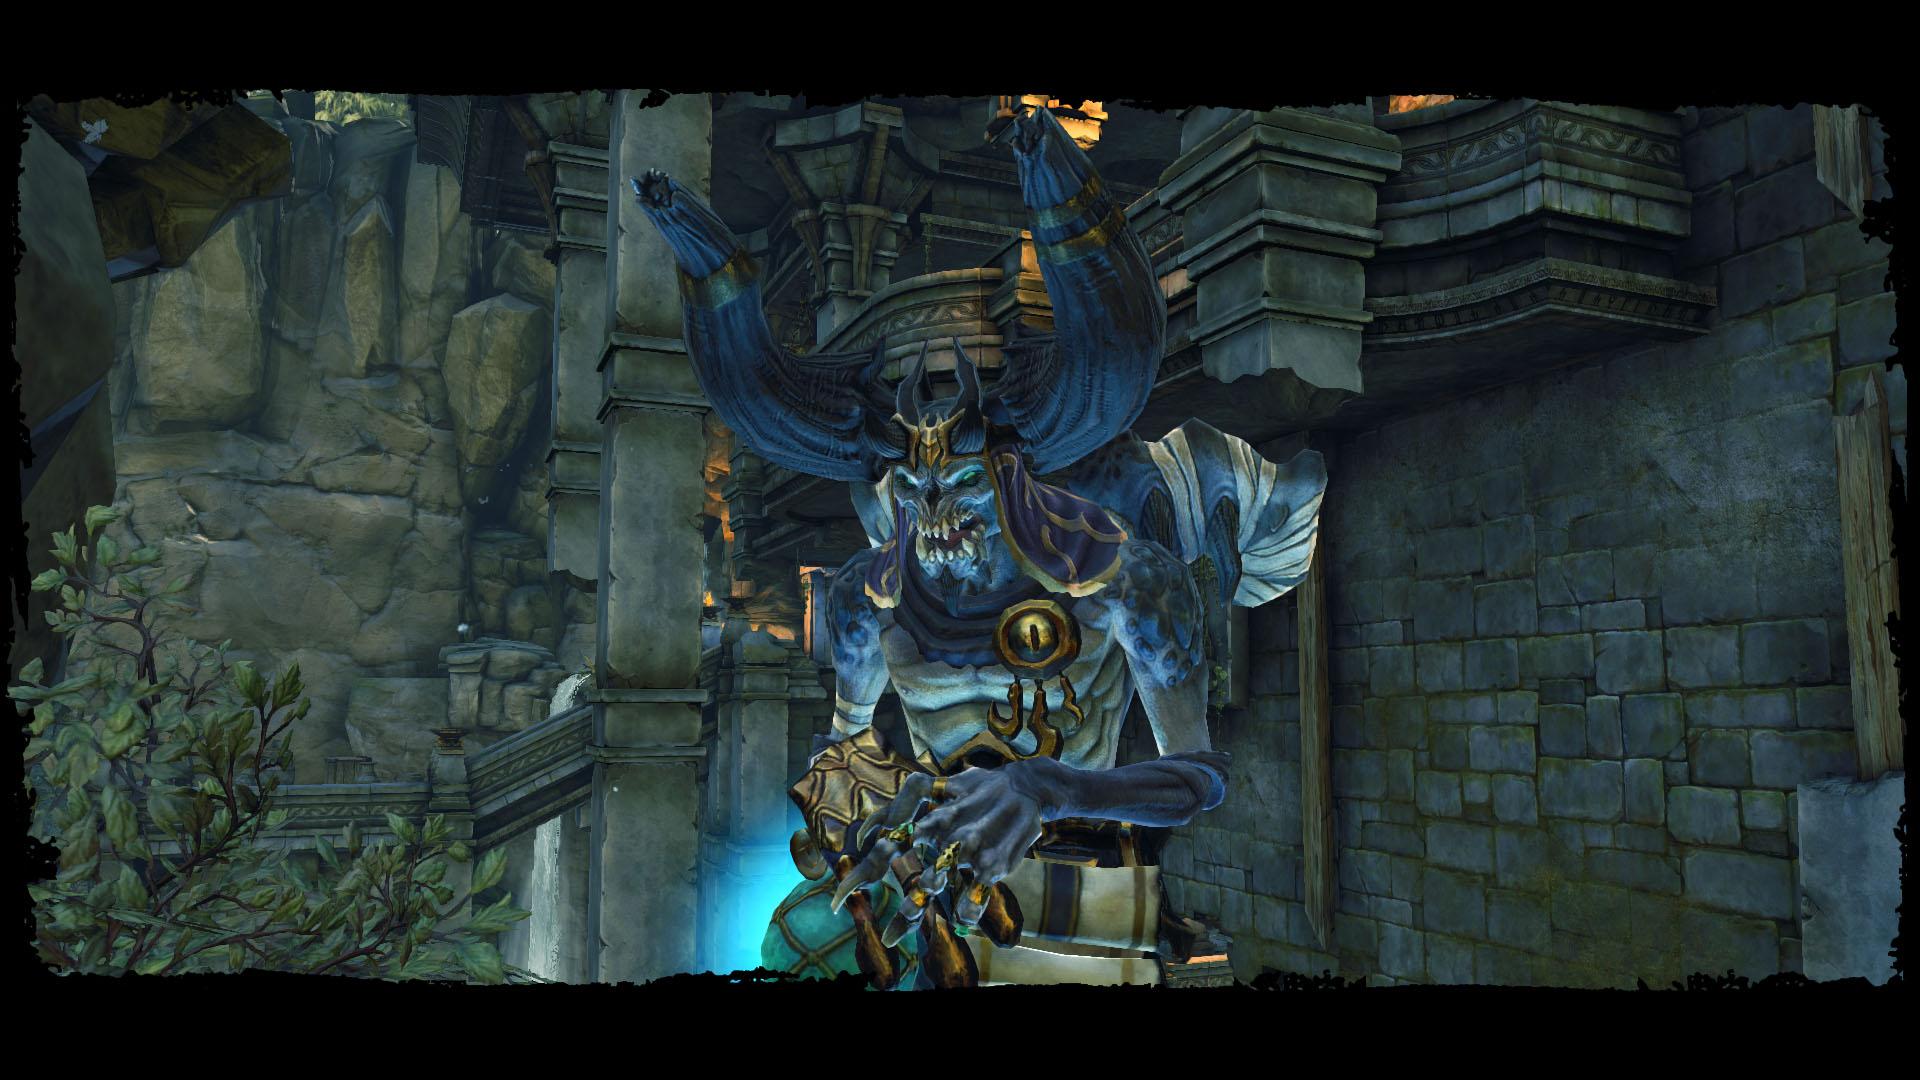 Darksiders II Deathinitive Edition - Vulgrim | Steam ...  Darksiders II D...